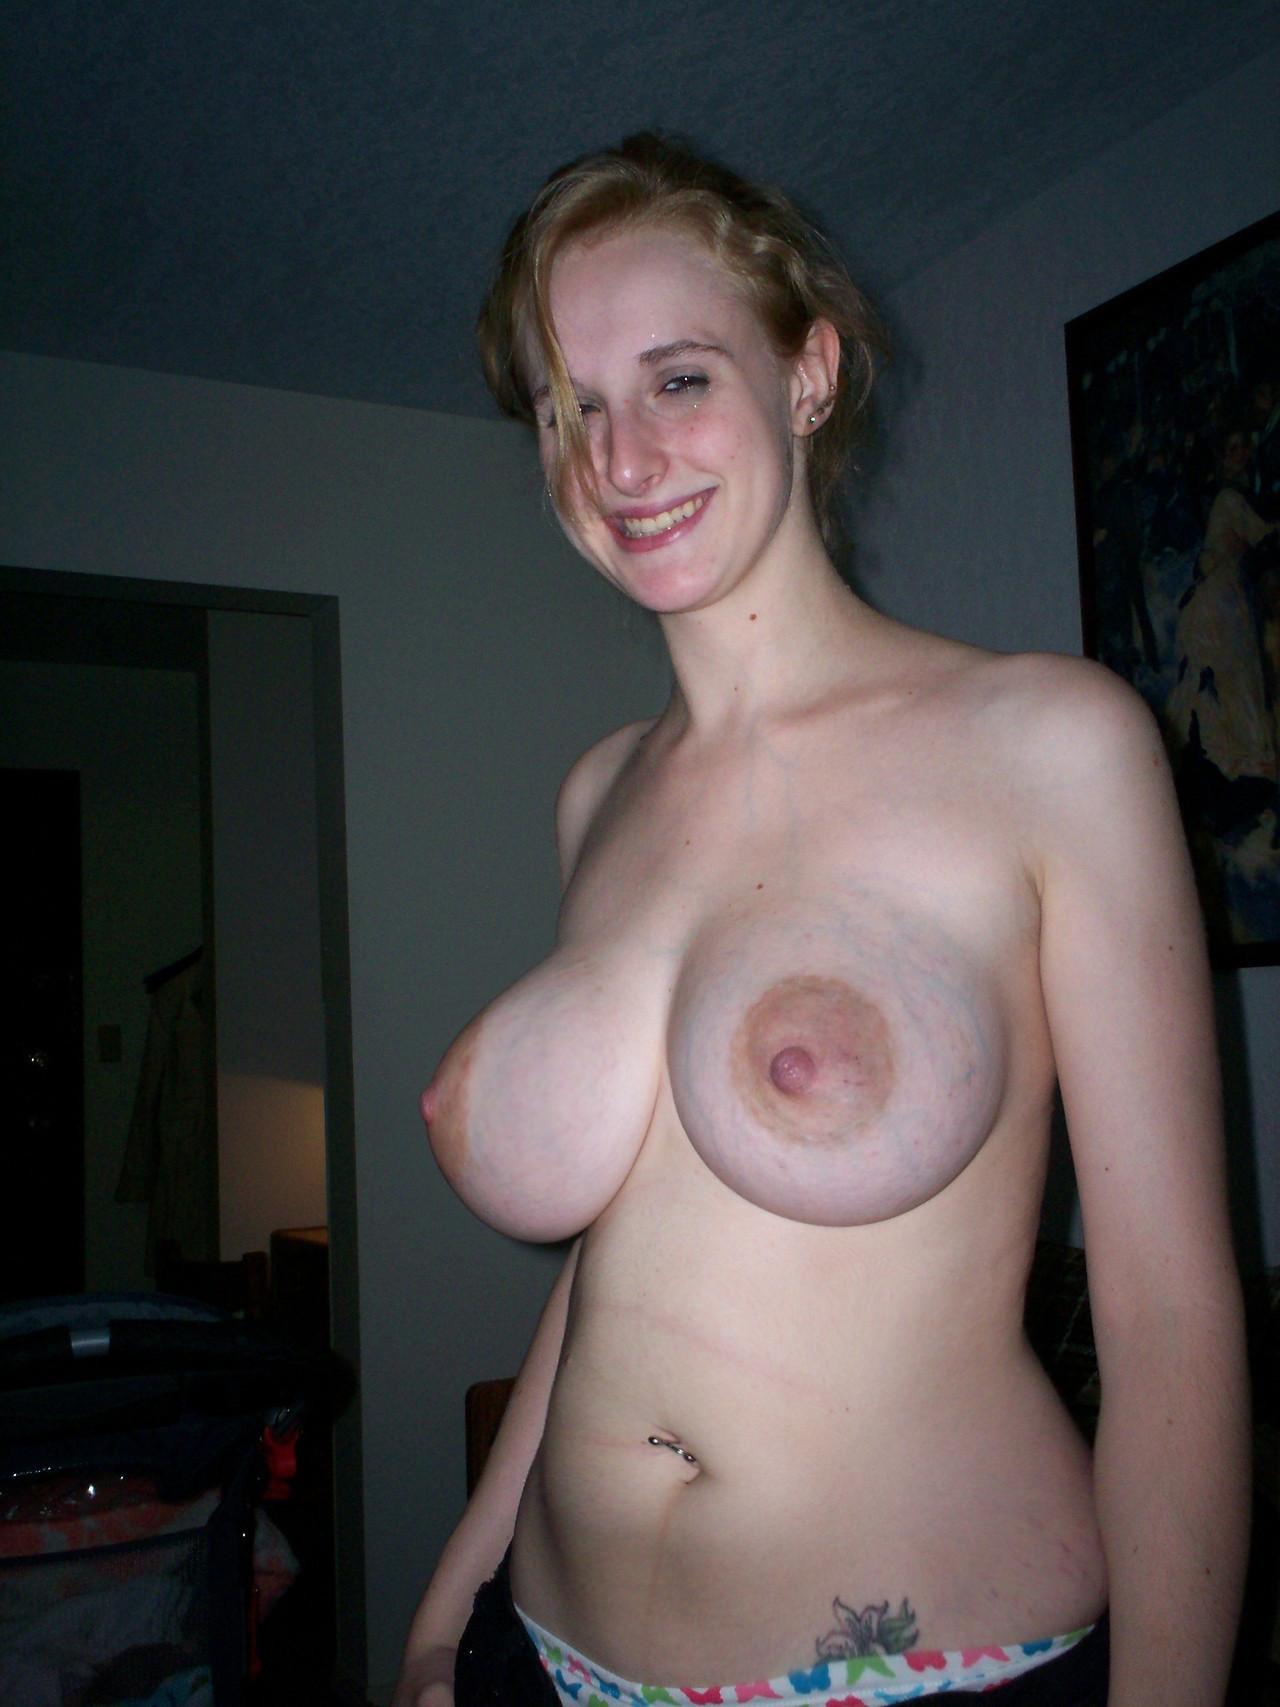 tumblr swollen boobs